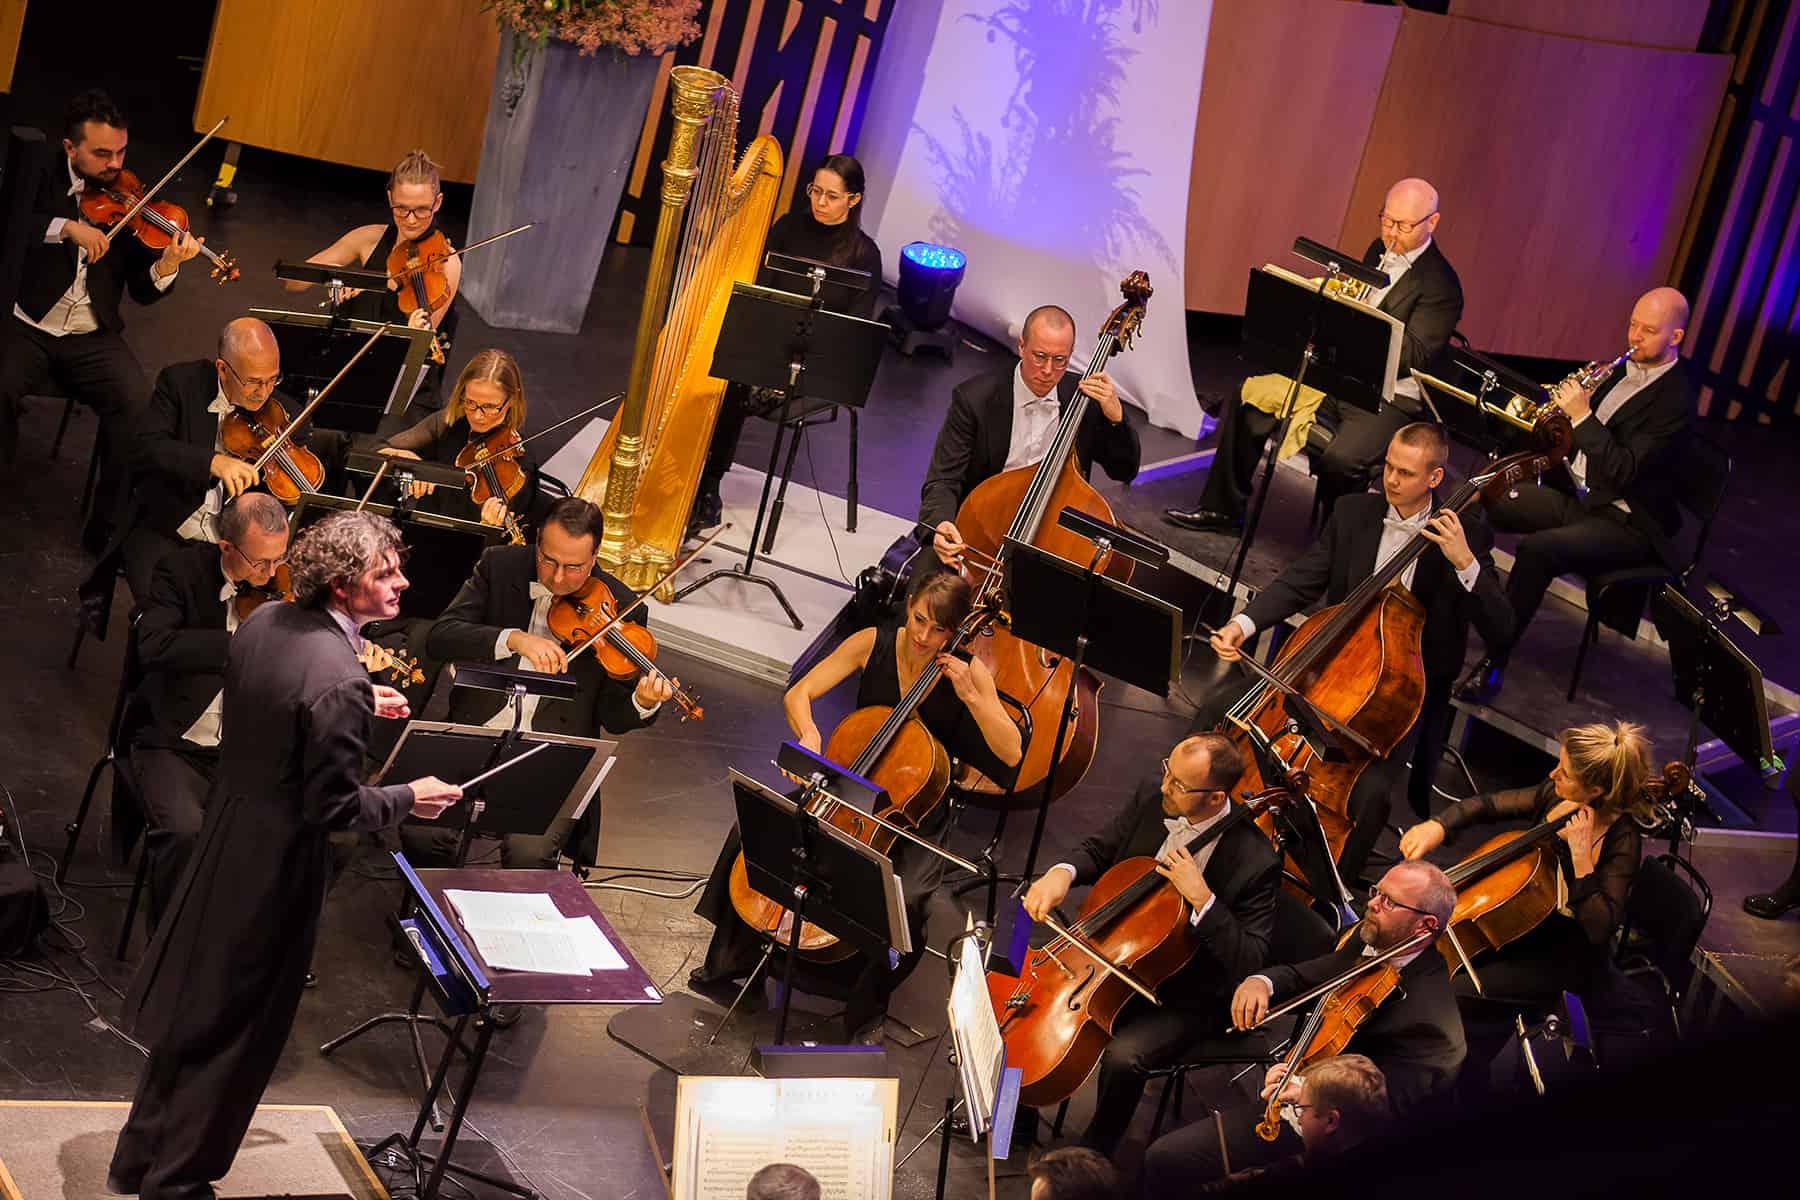 Wermland Opera